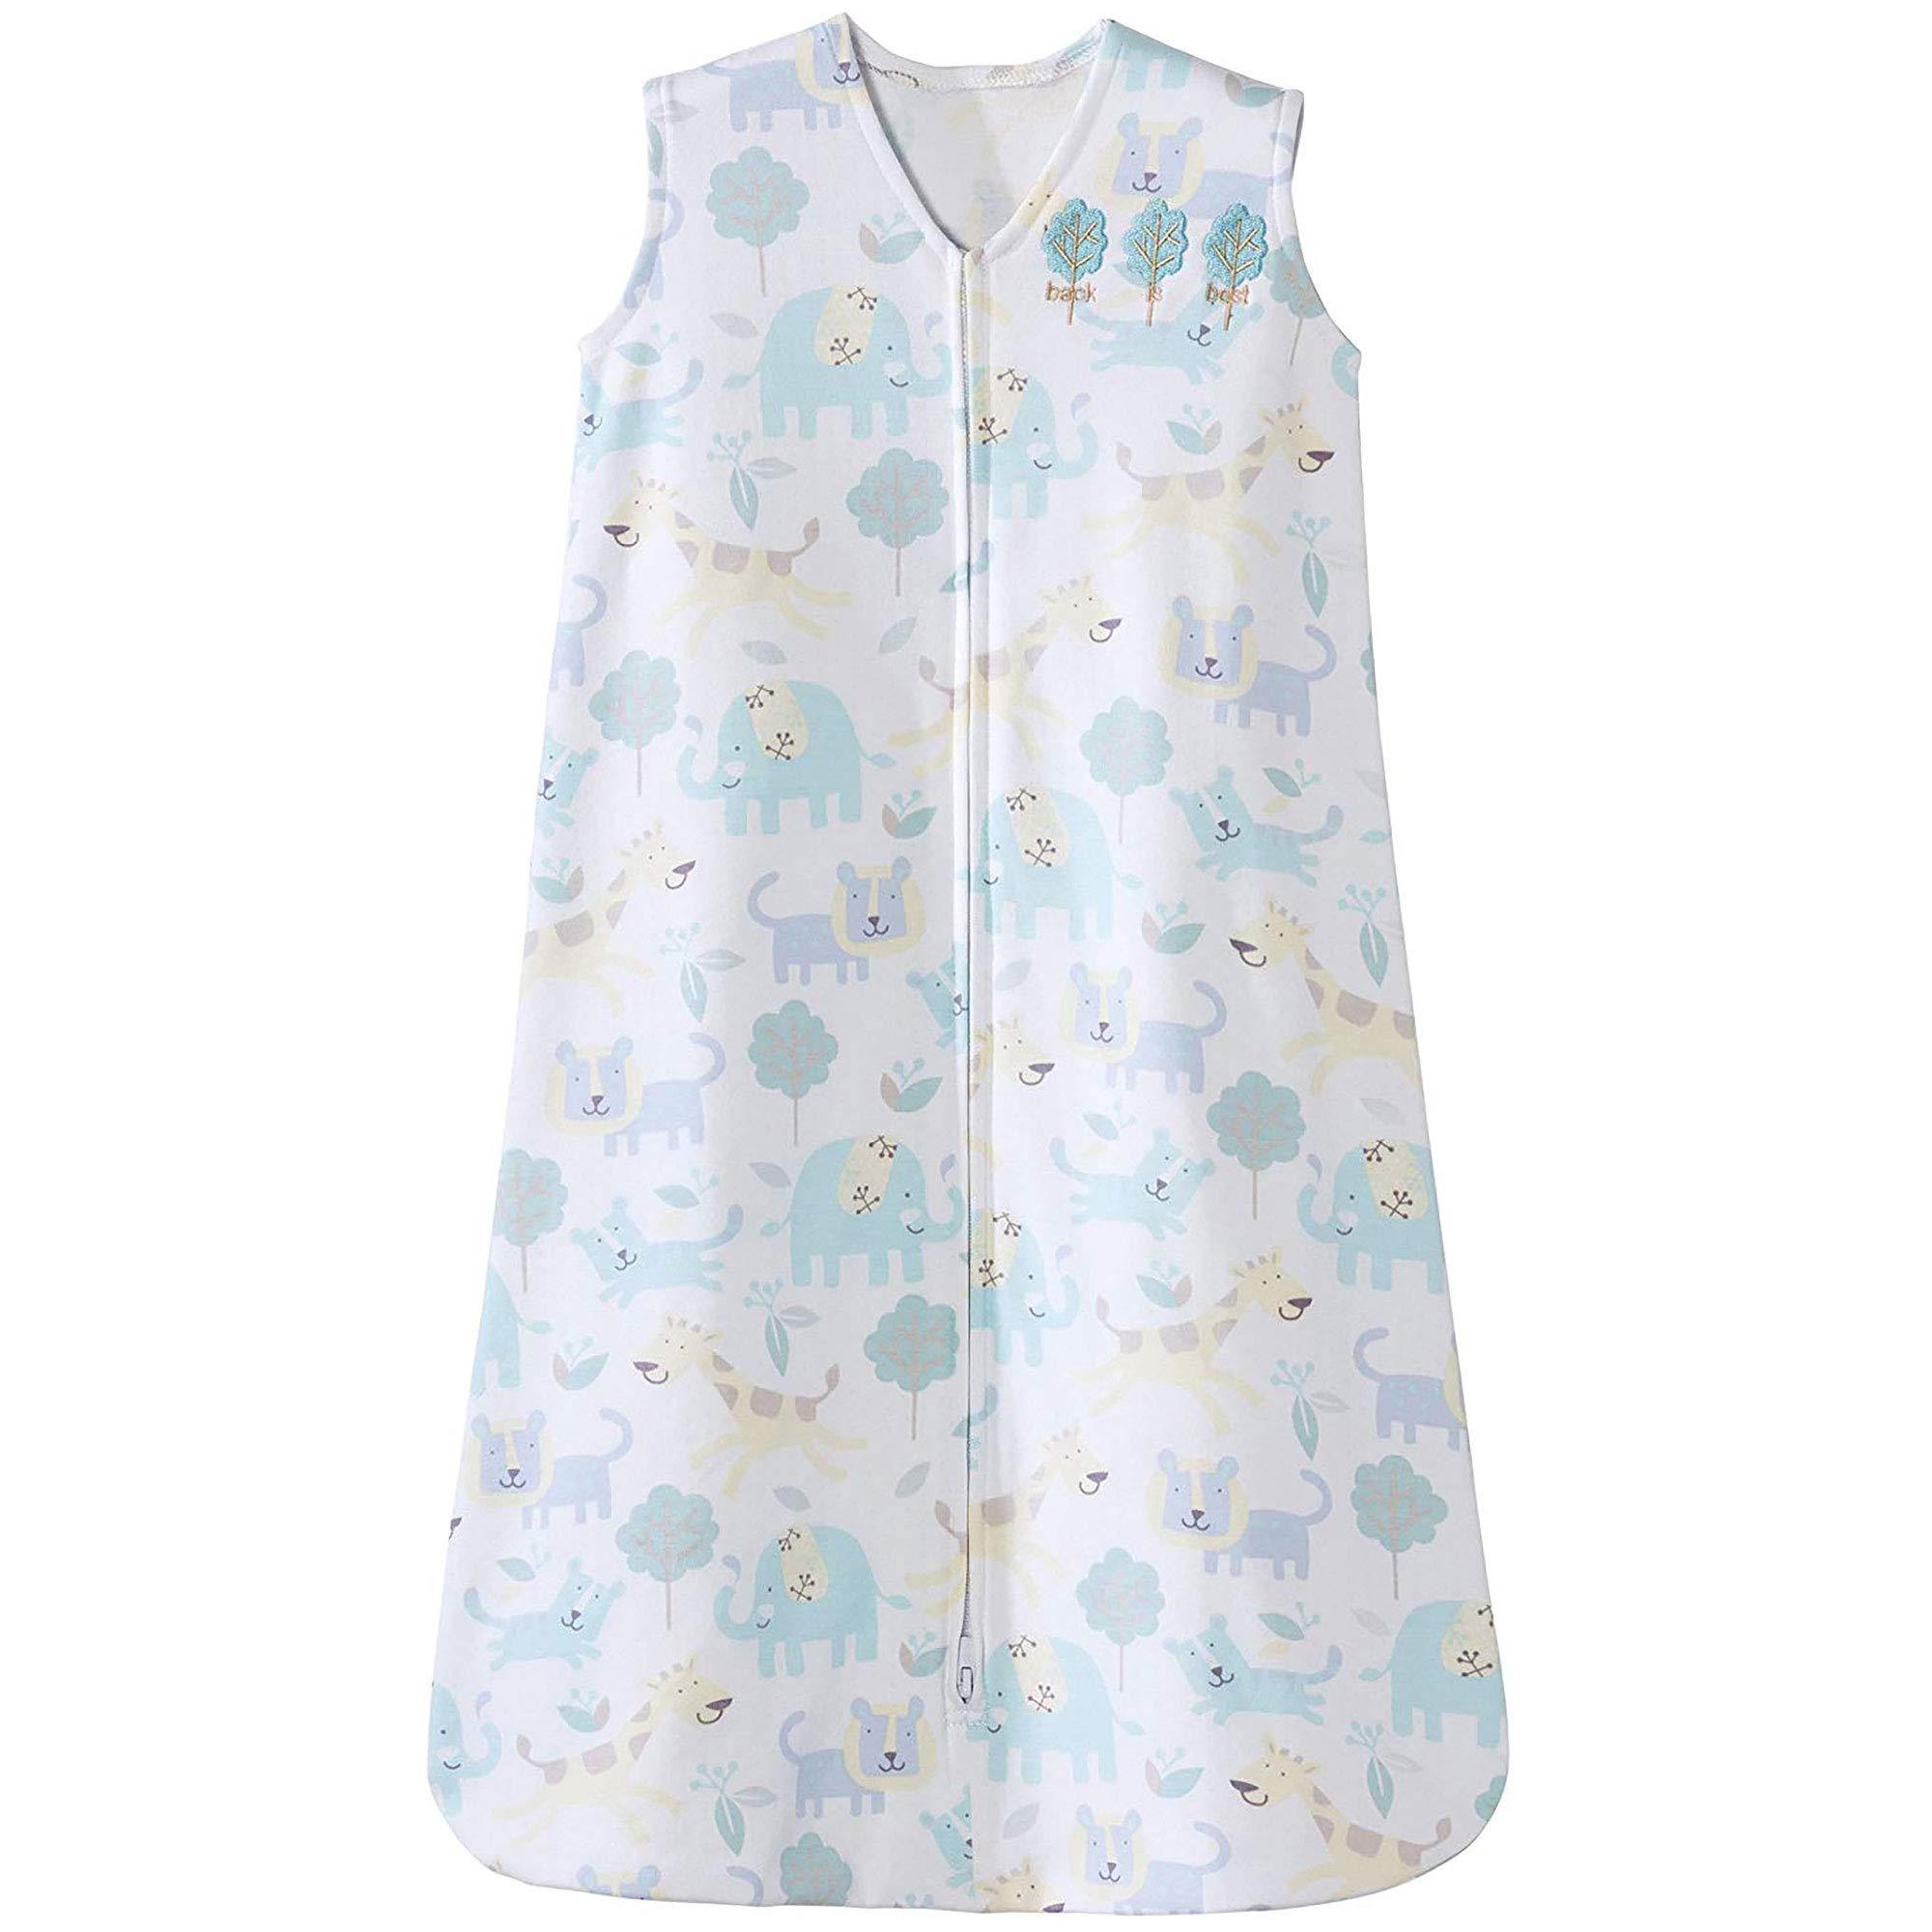 Halo Sleepsack Cotton Wearable Blanket, Blue Jungle Animal, Medium